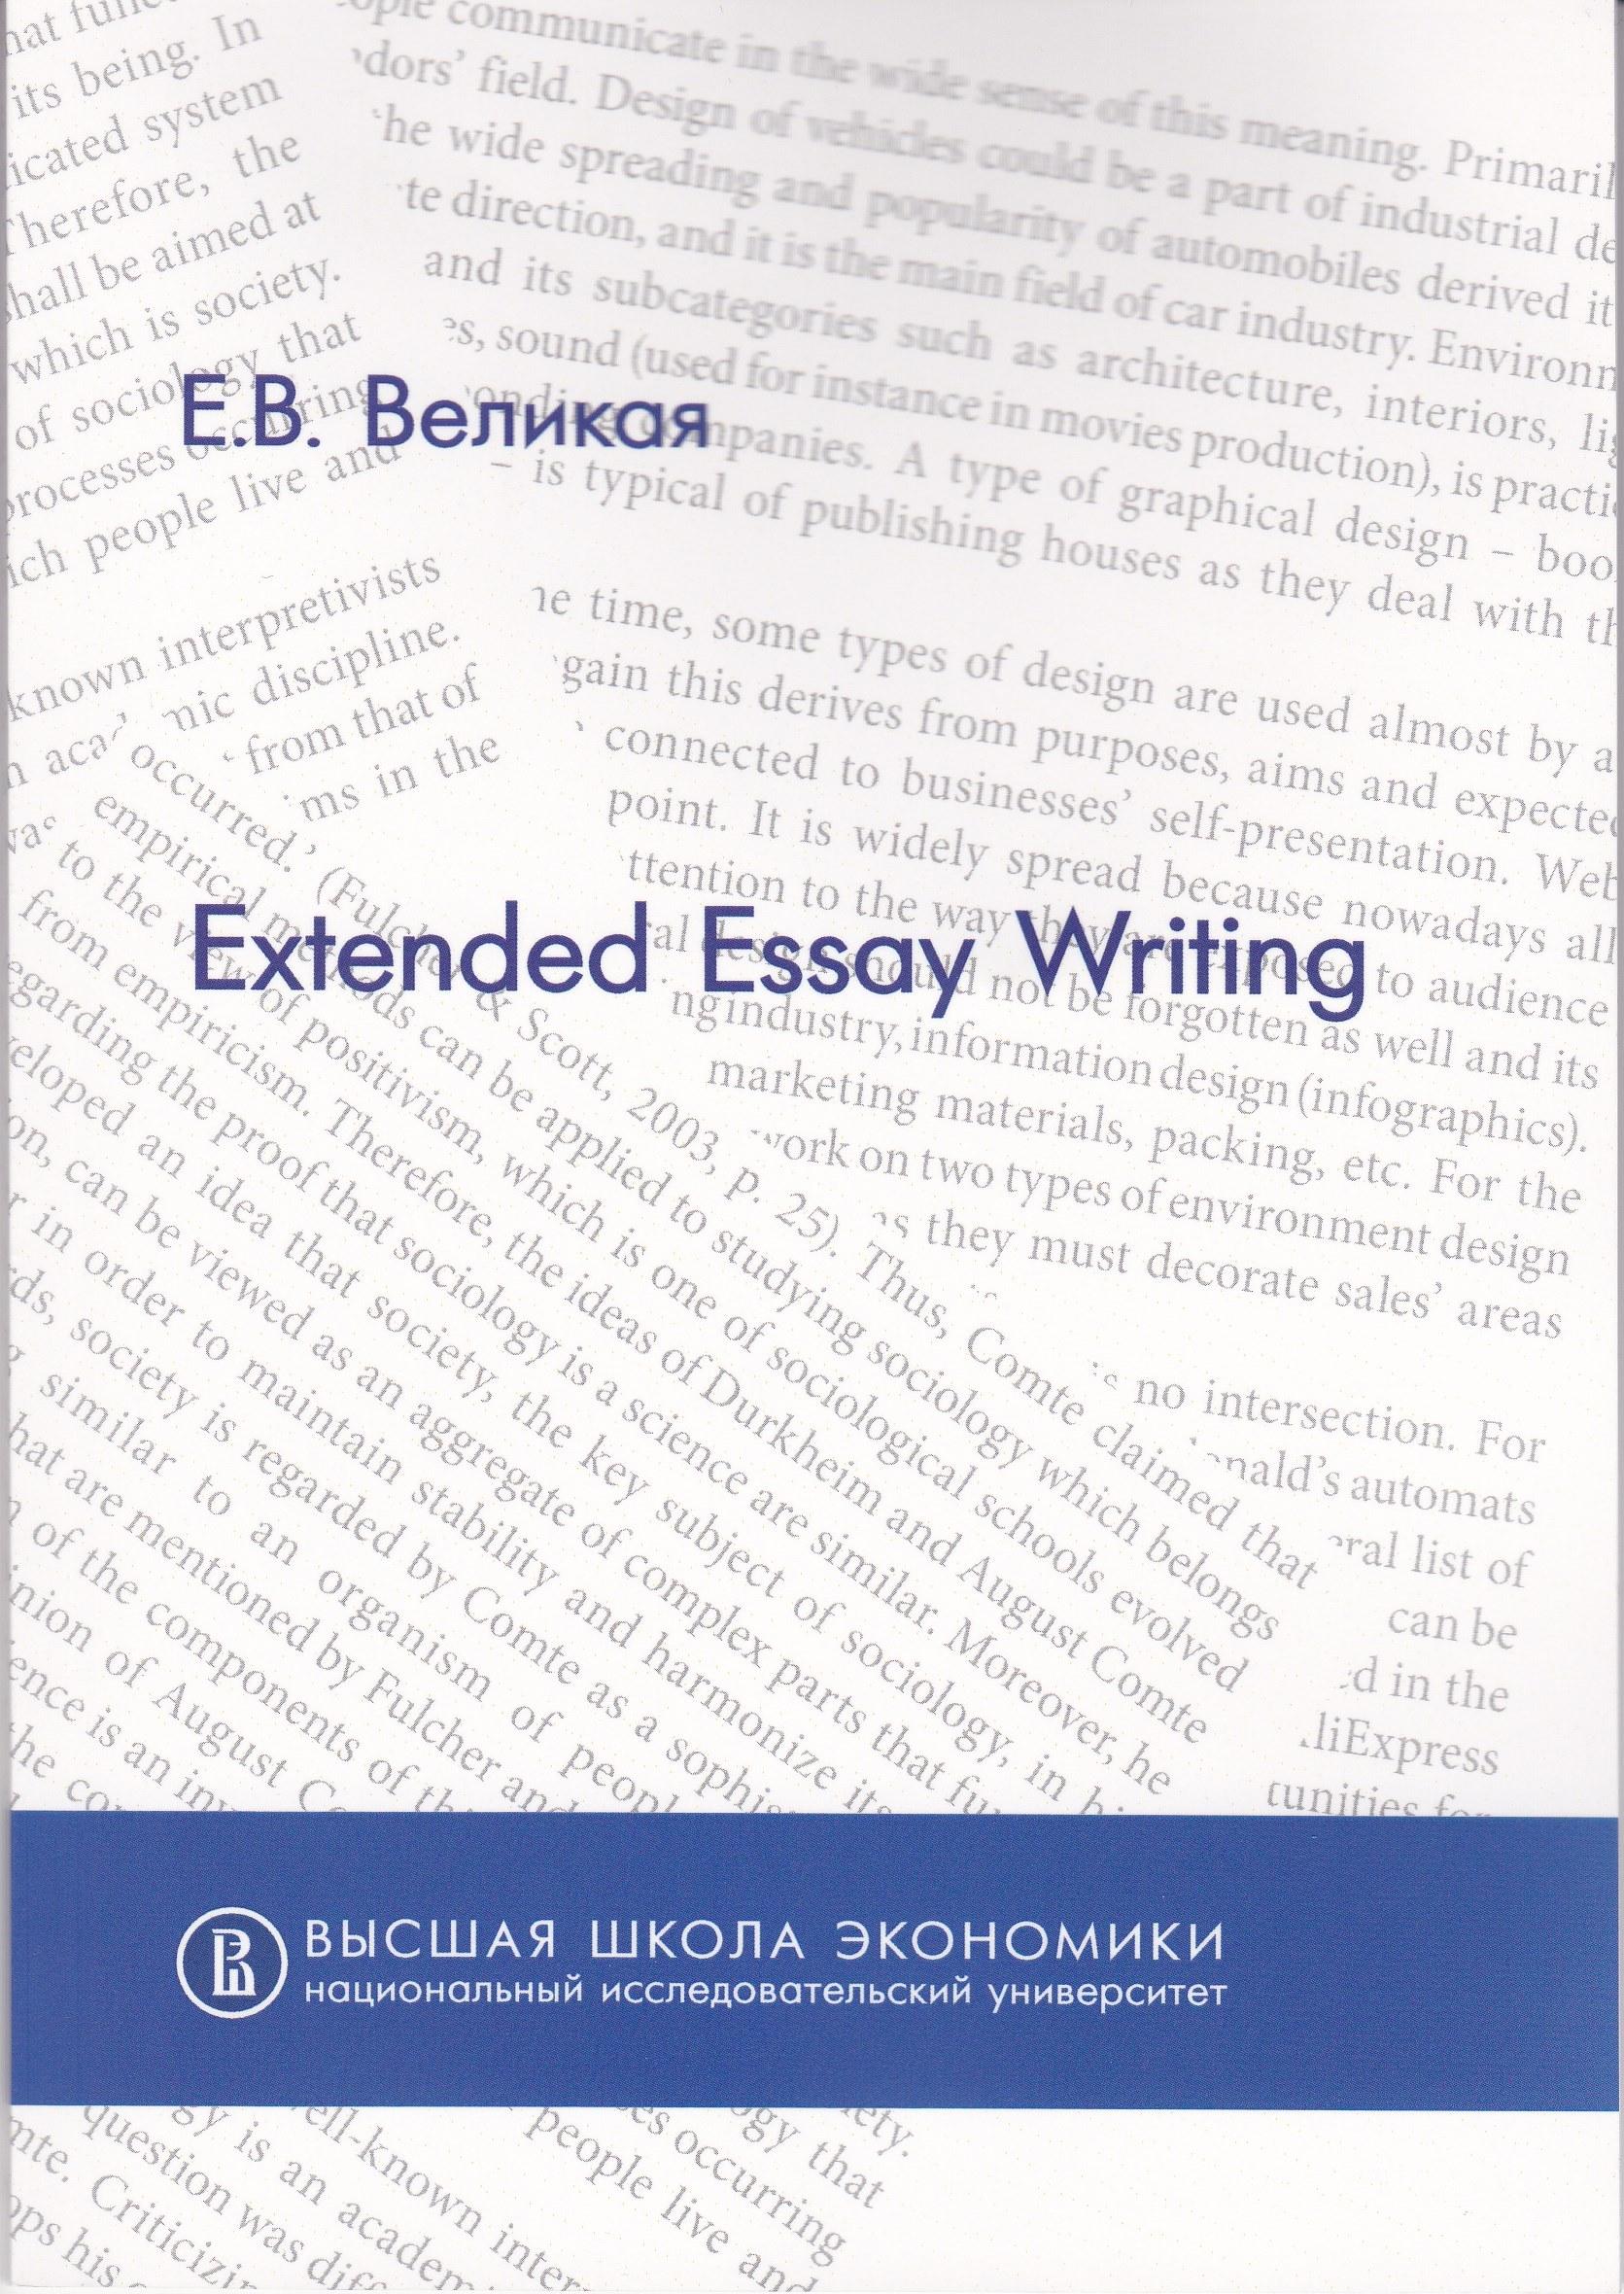 Extended Essay Writing. Учебно-методическое пособие